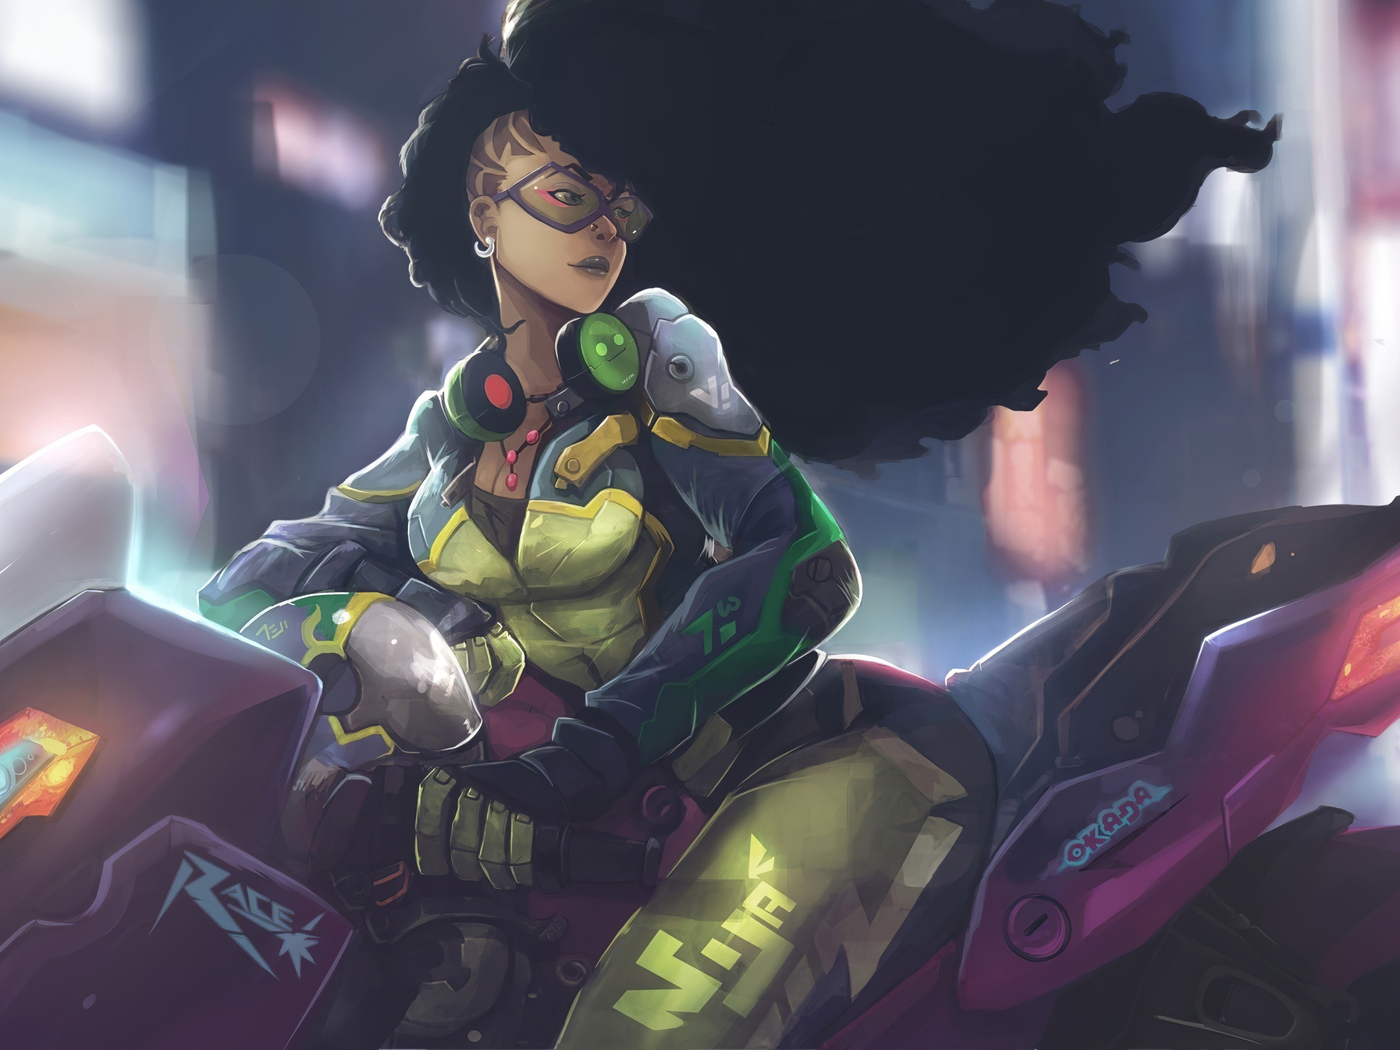 biker-nija-girl-4k-qv.jpg